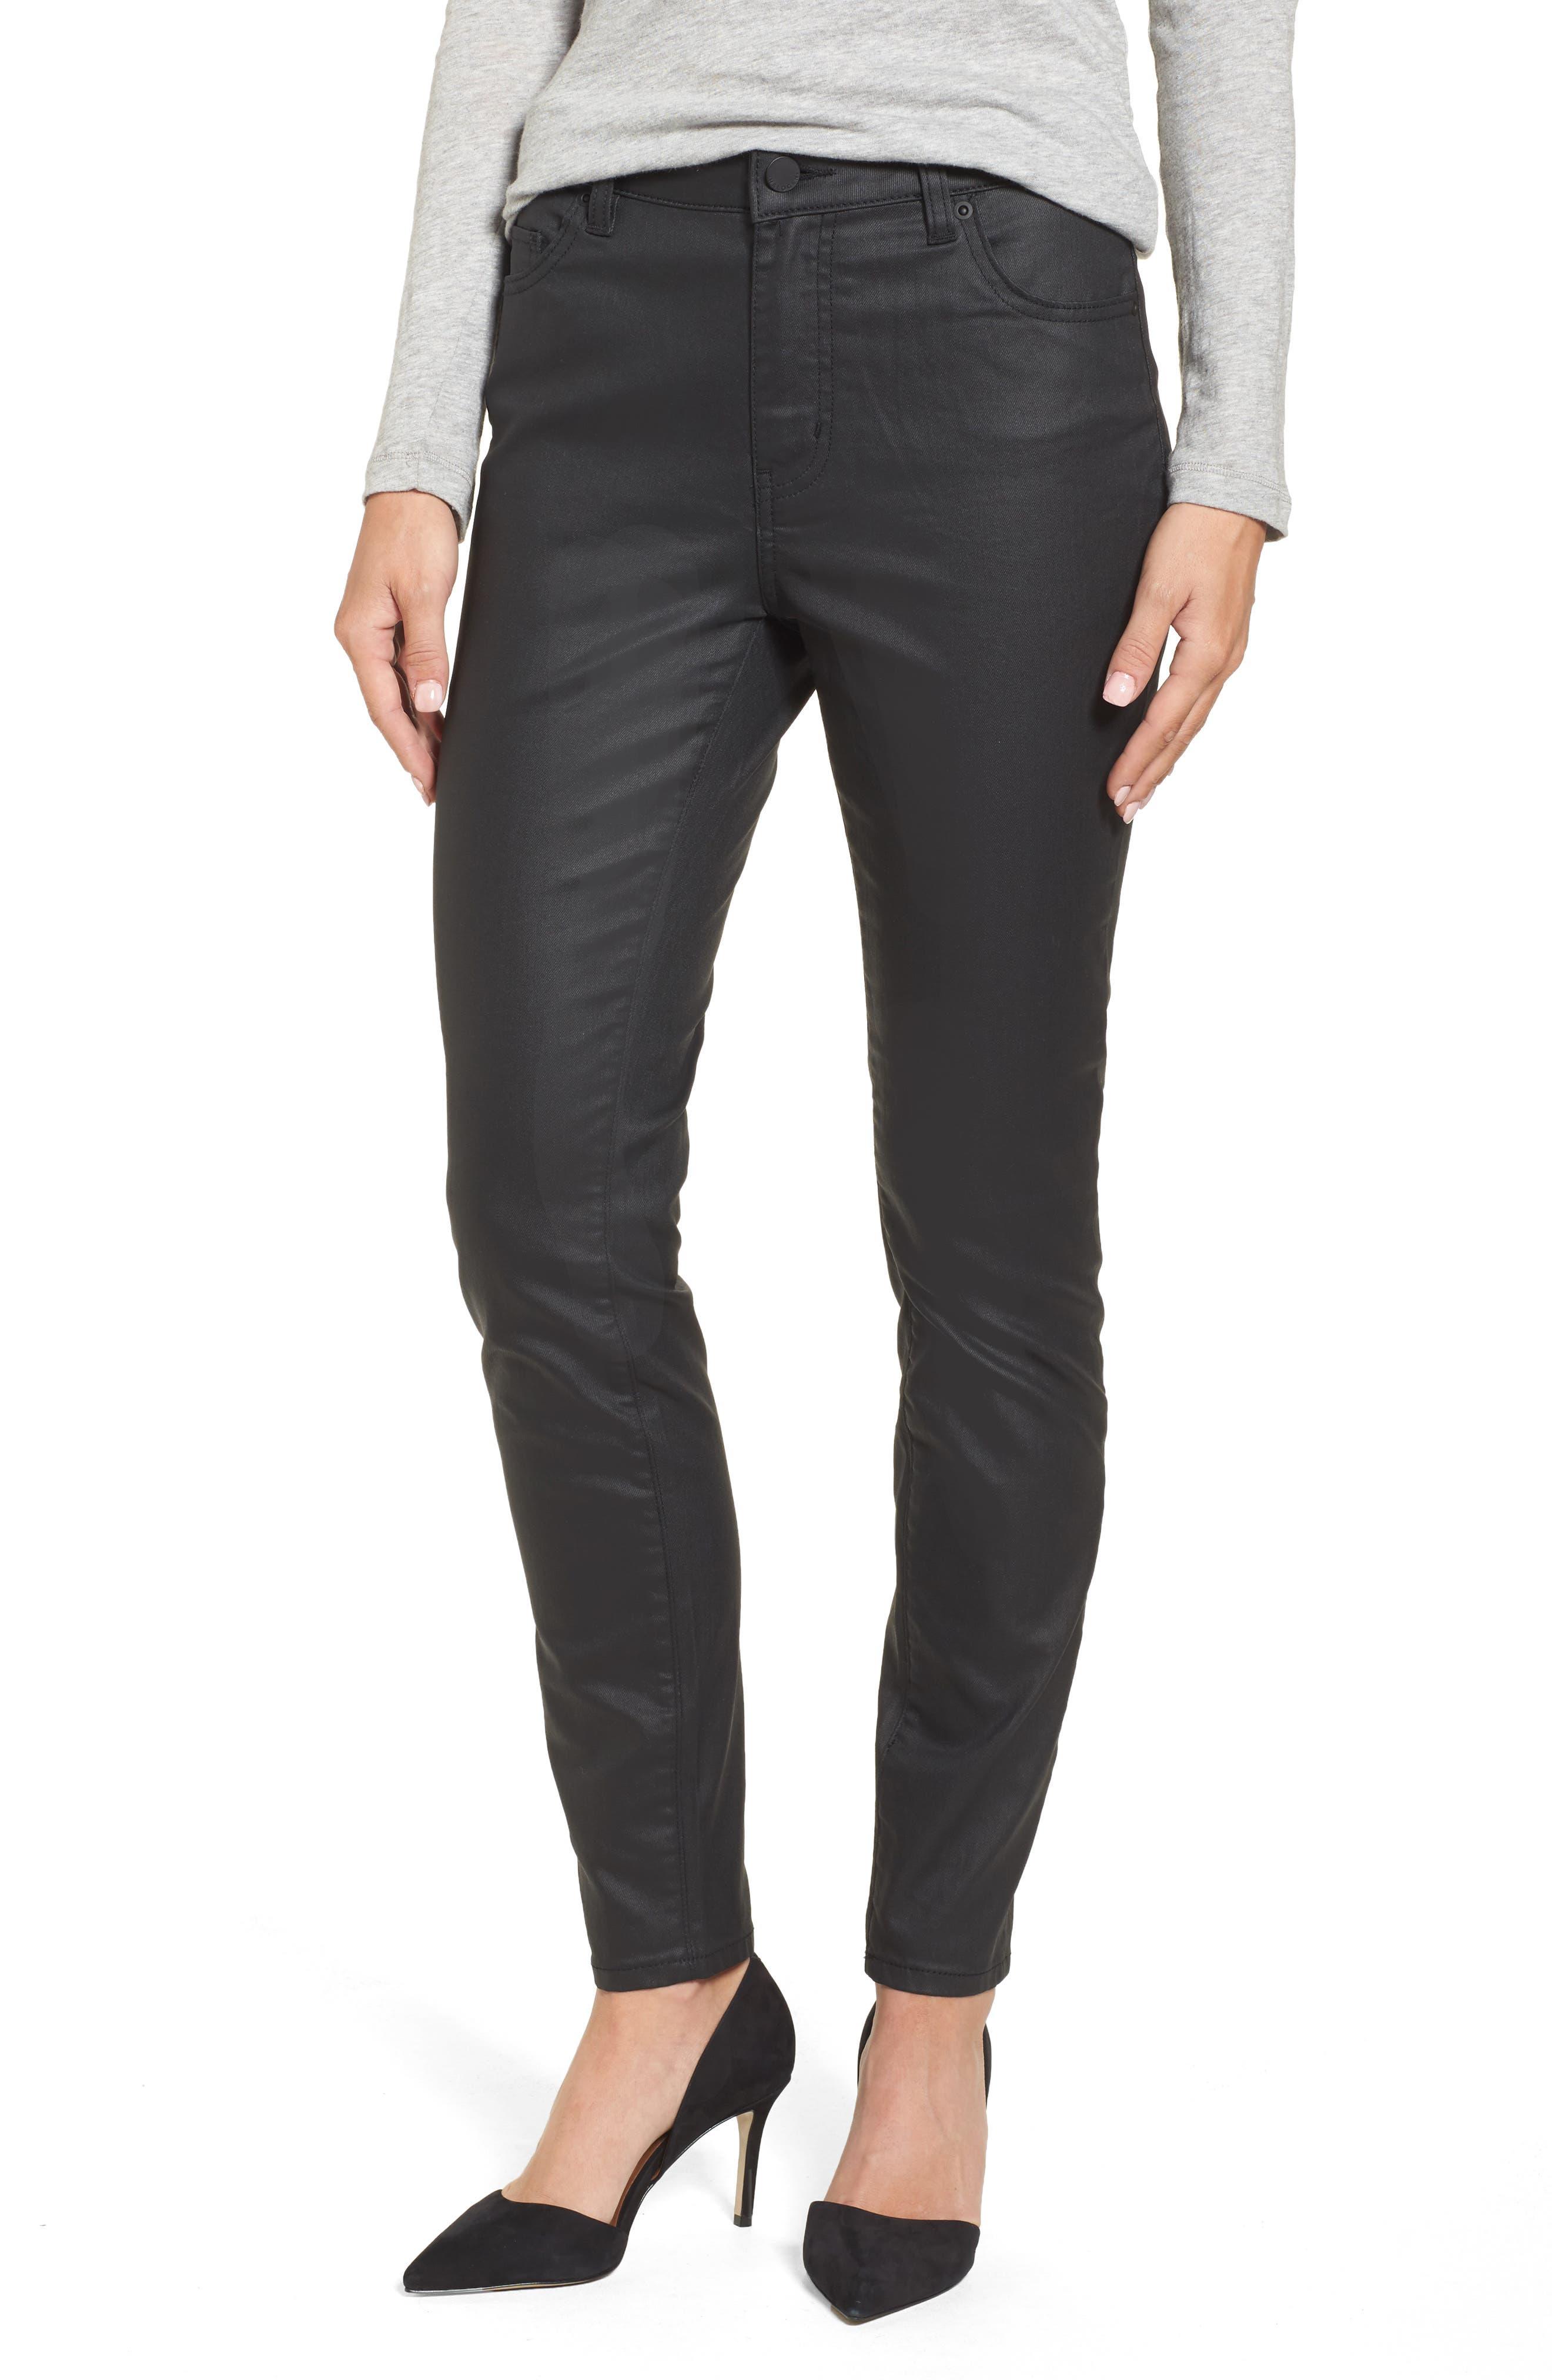 Alternate Image 1 Selected - Halogen® Coated Skinny Jeans (Regular & Petite)